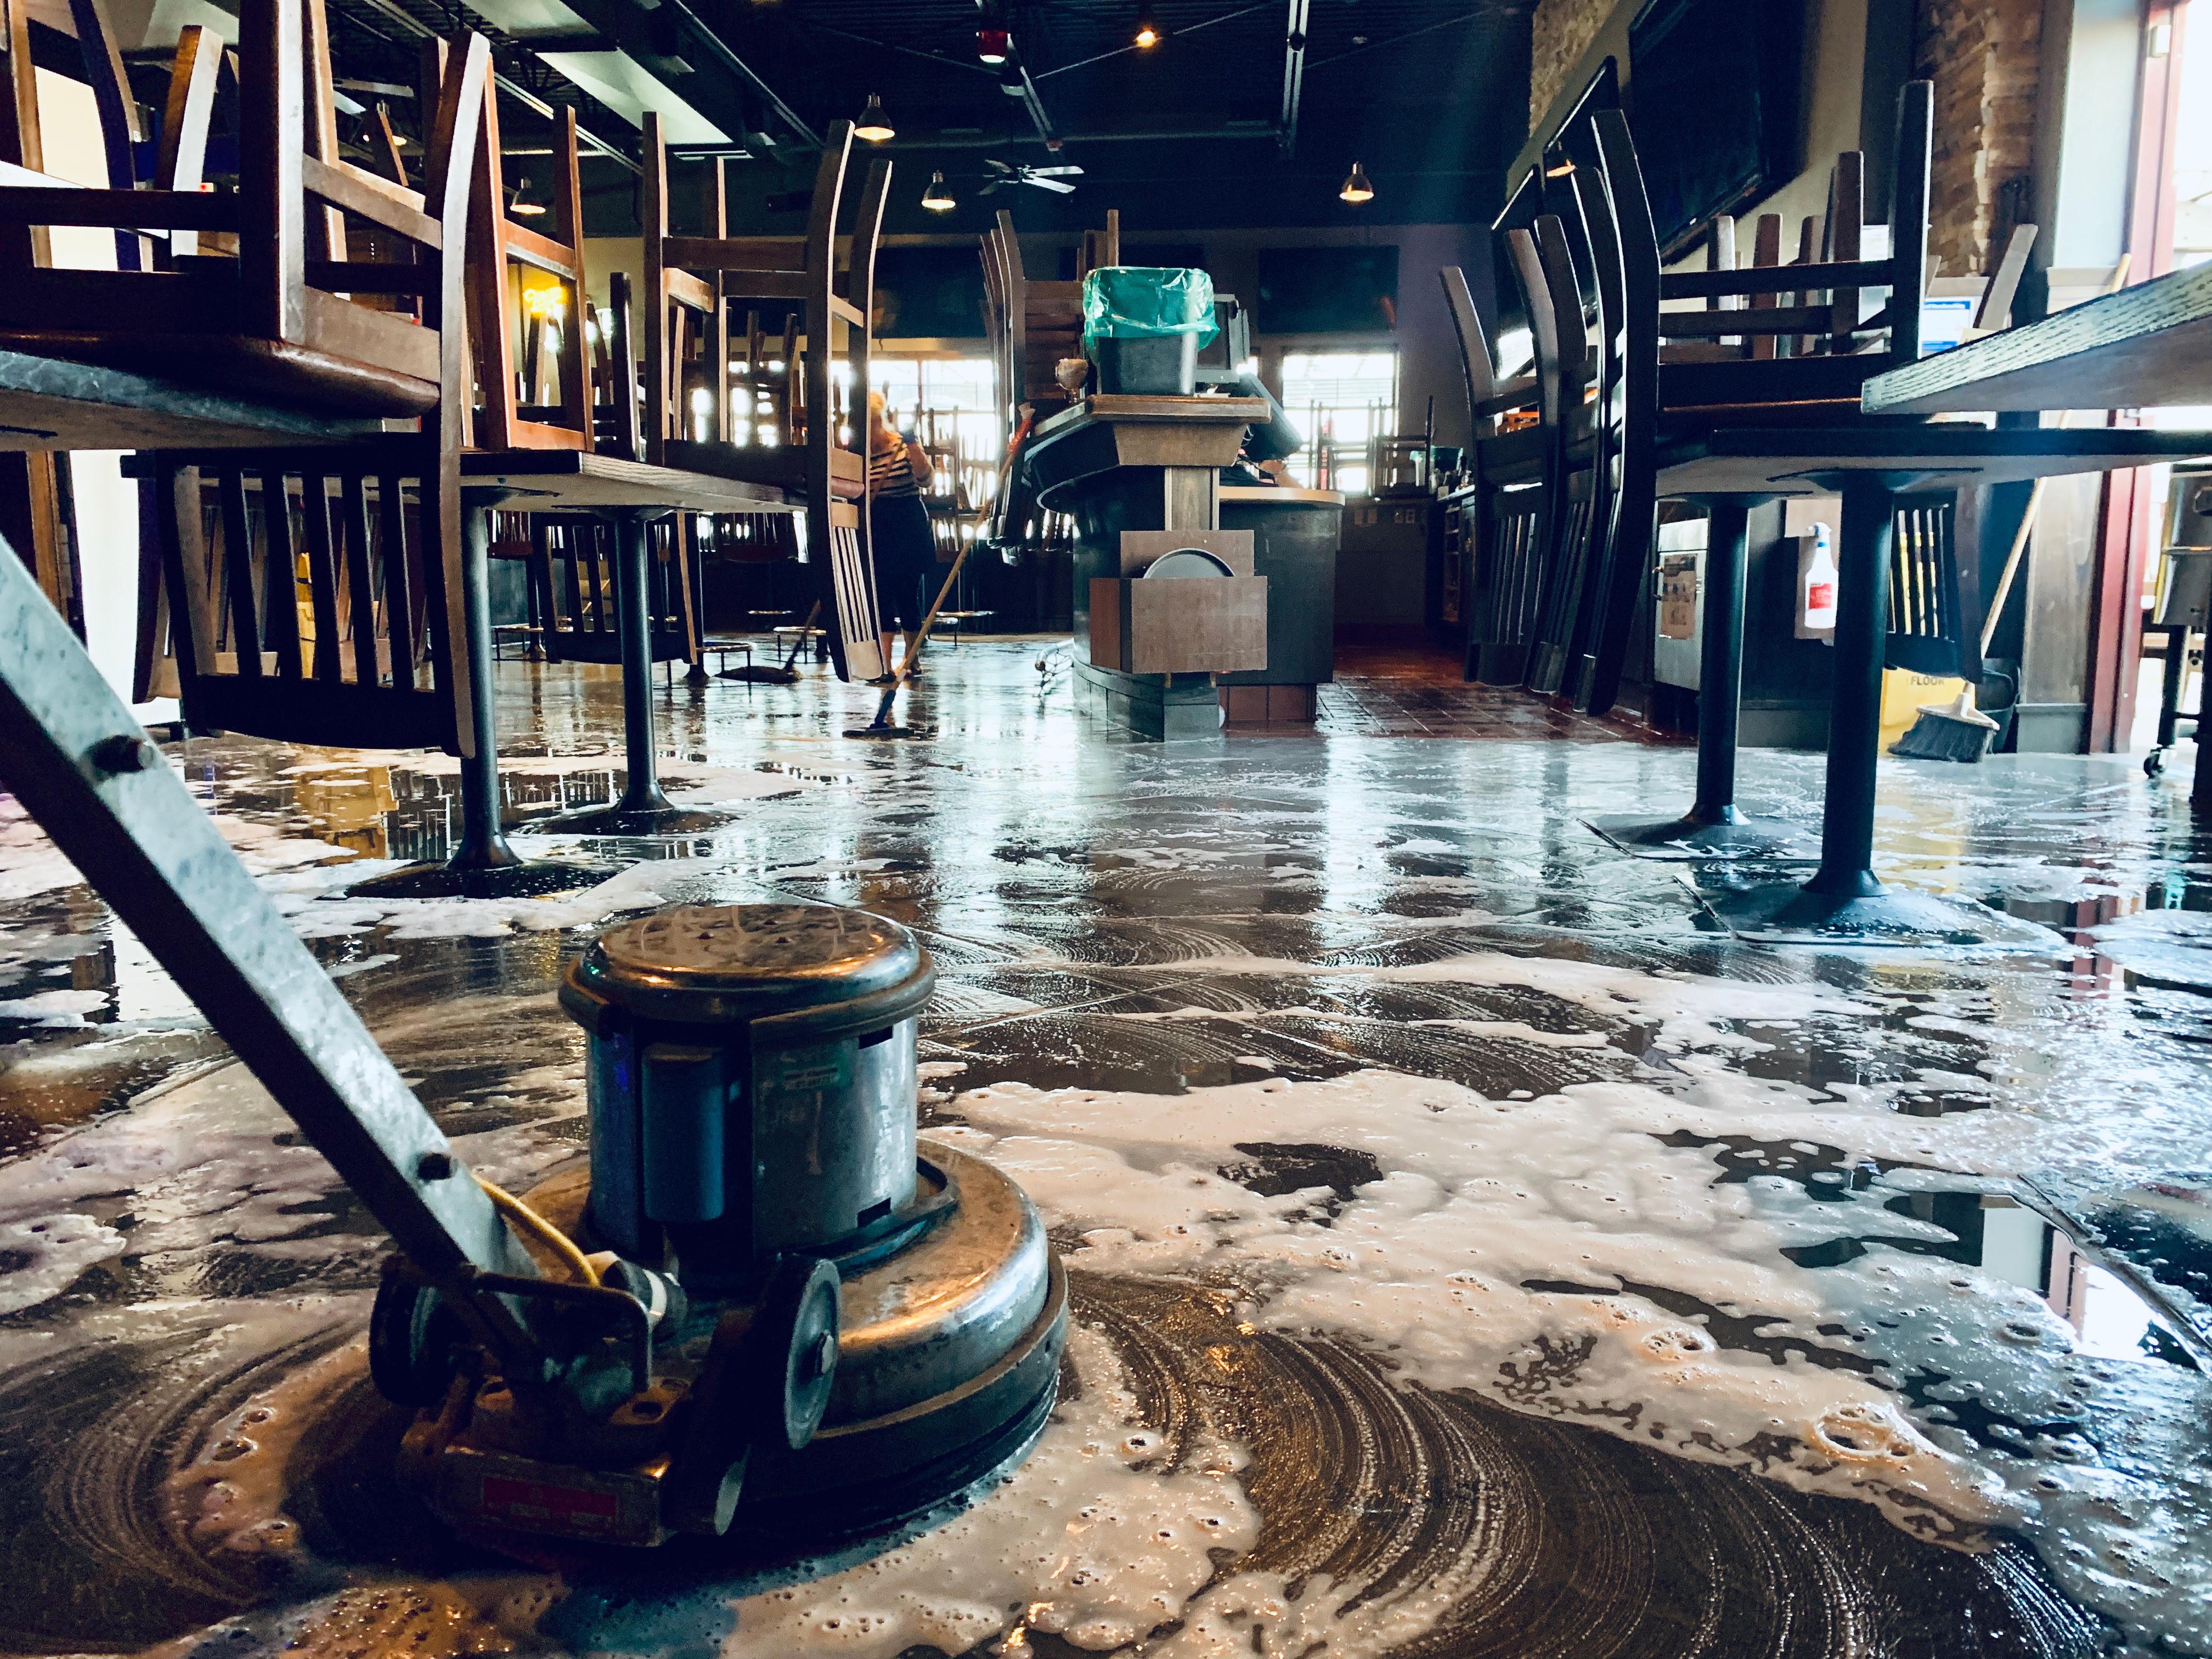 Floor Stripping & Waxing Quote